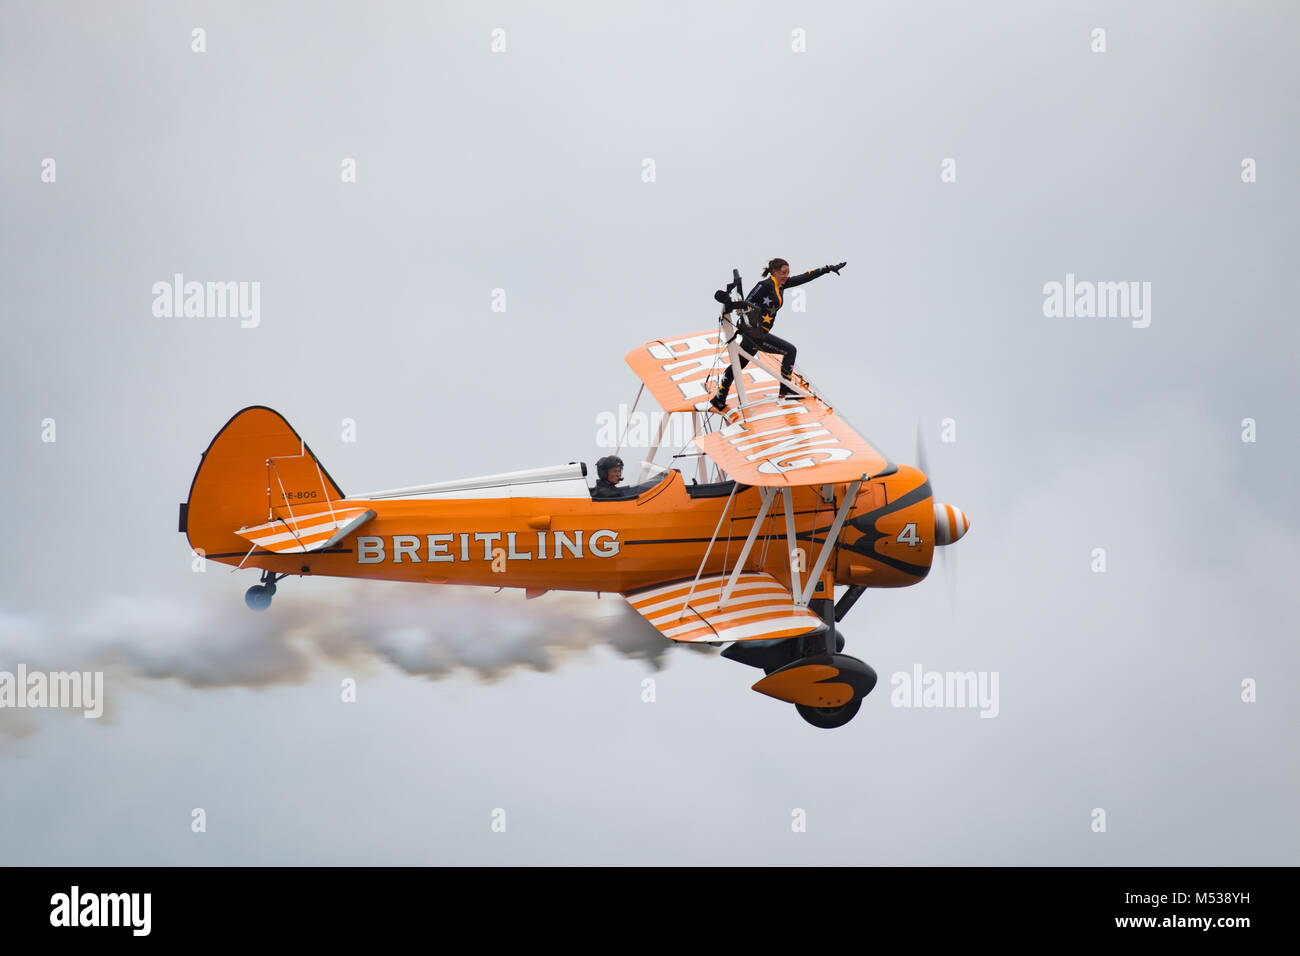 Breitling Wing Walkers in flight. Stock Photo